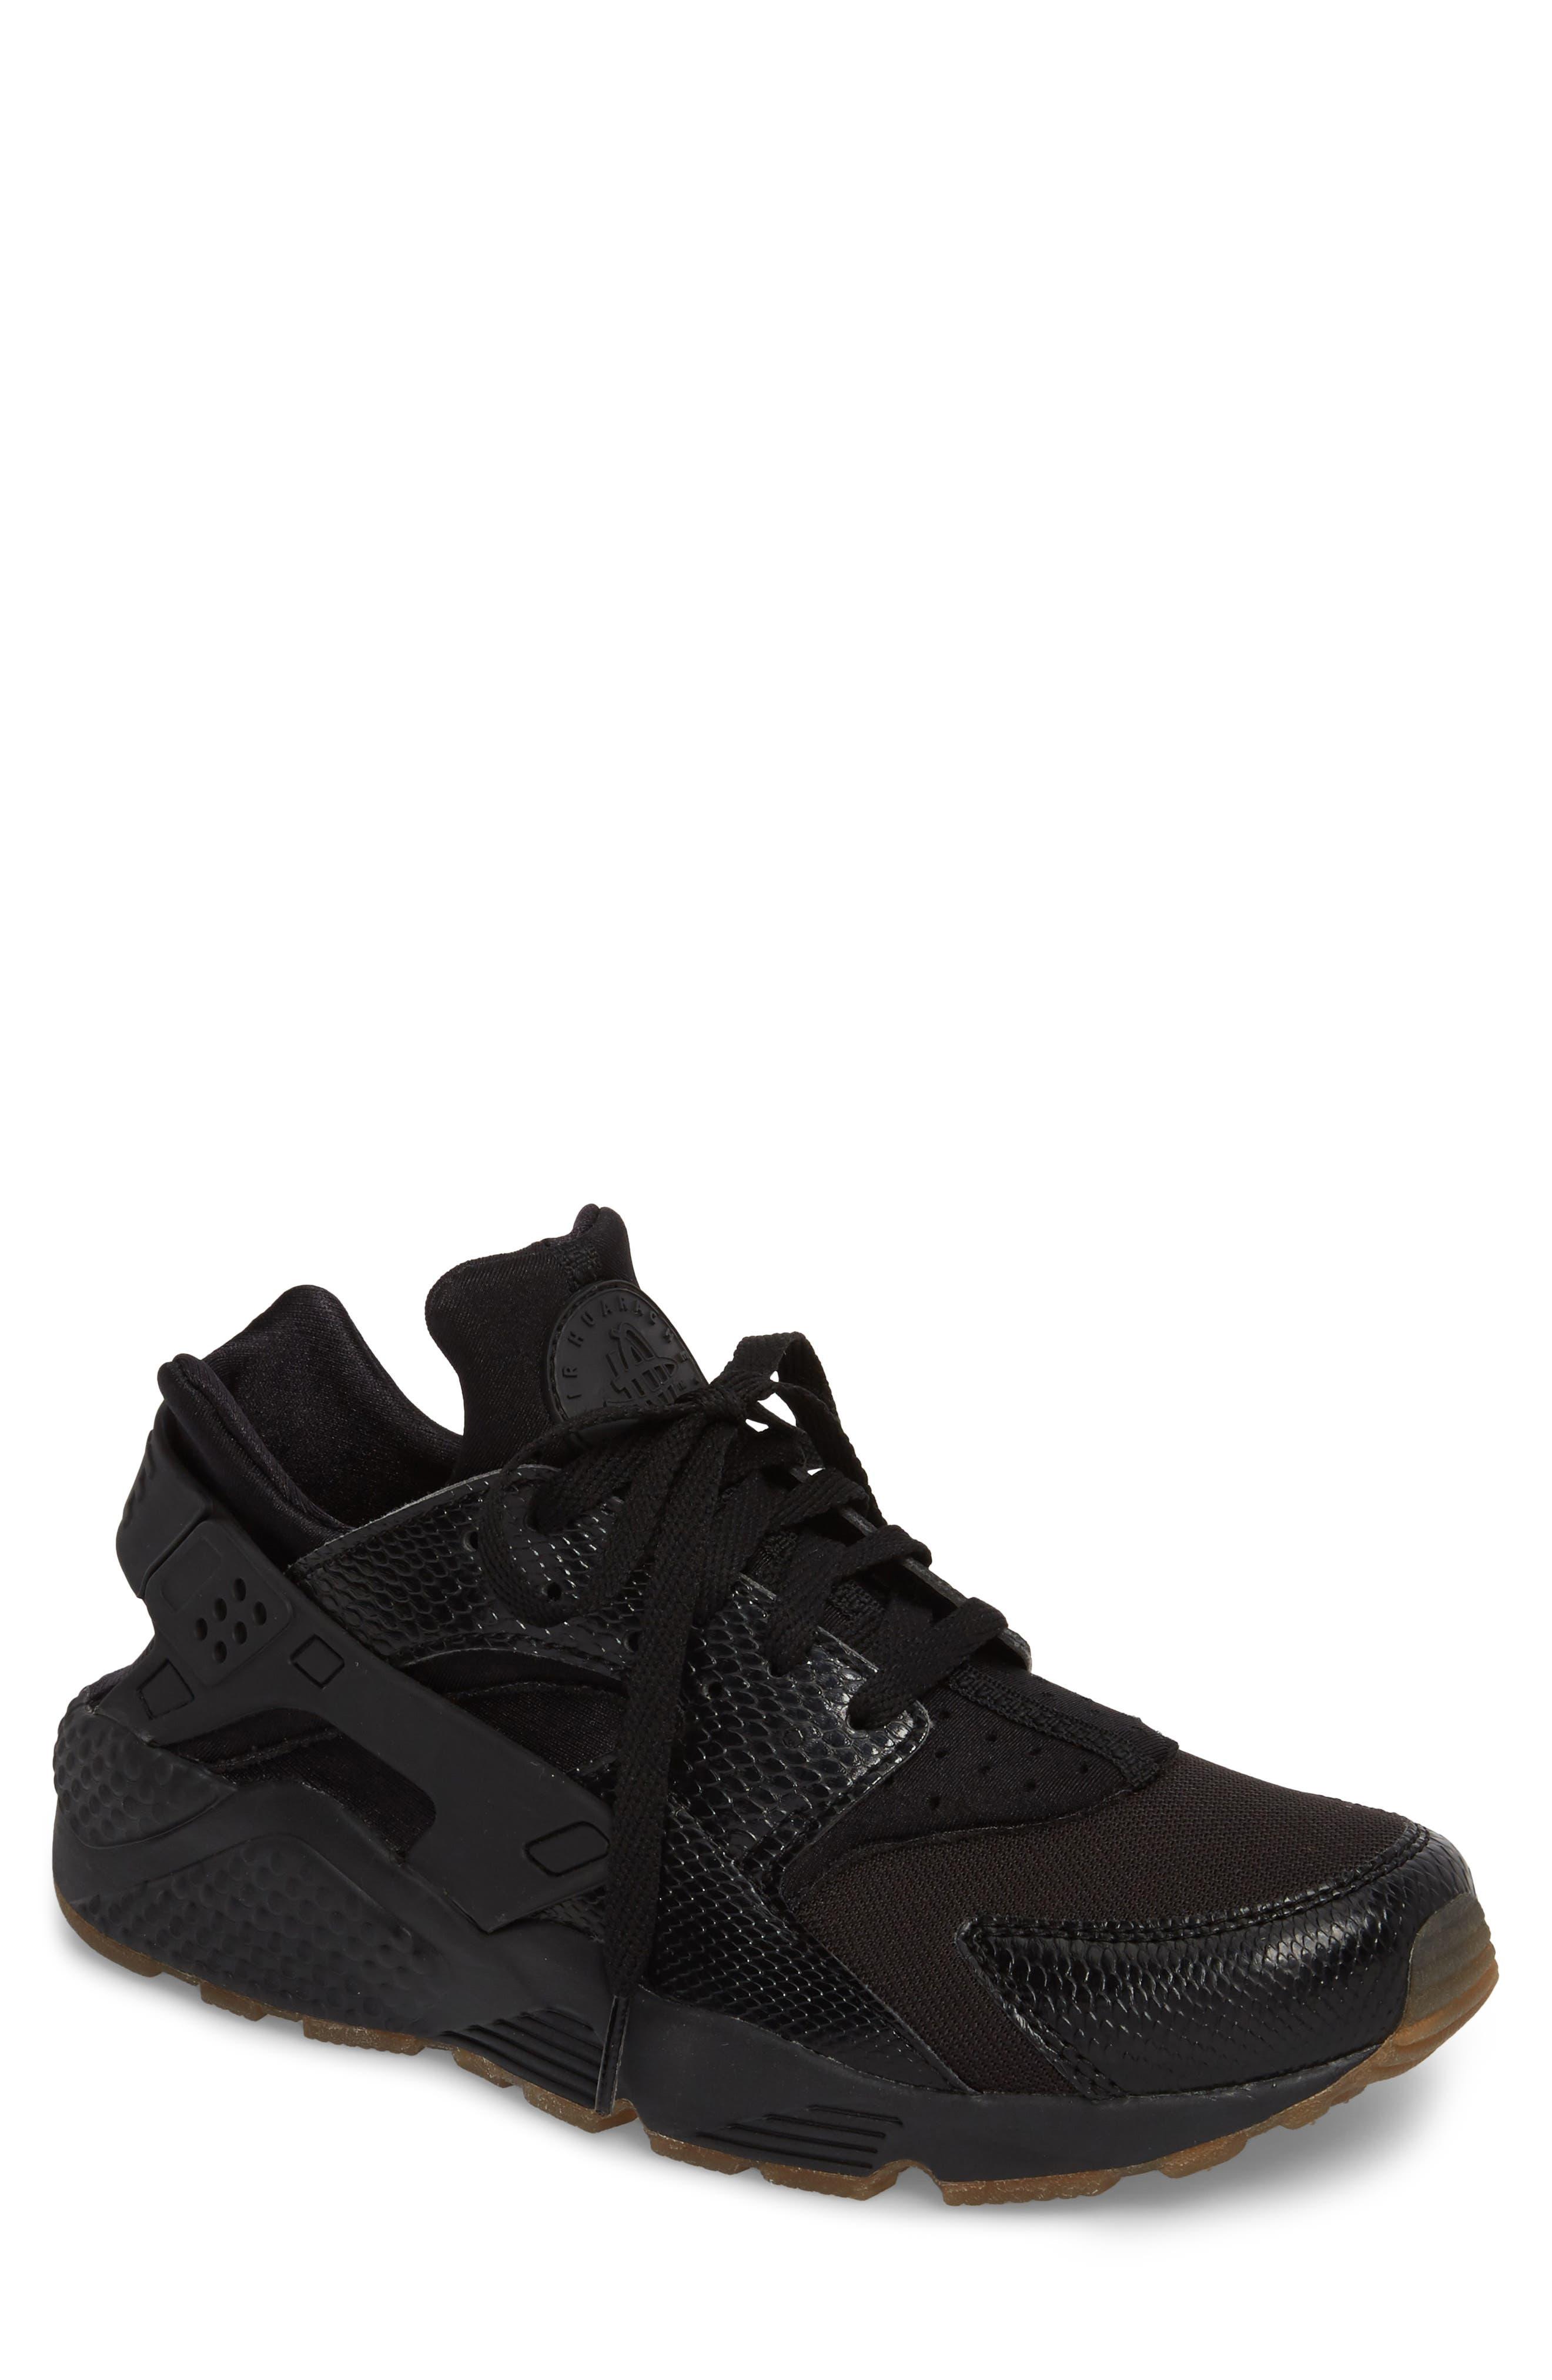 'Air Huarache' Sneaker,                         Main,                         color, Black/ Elemental Gold/ Brown